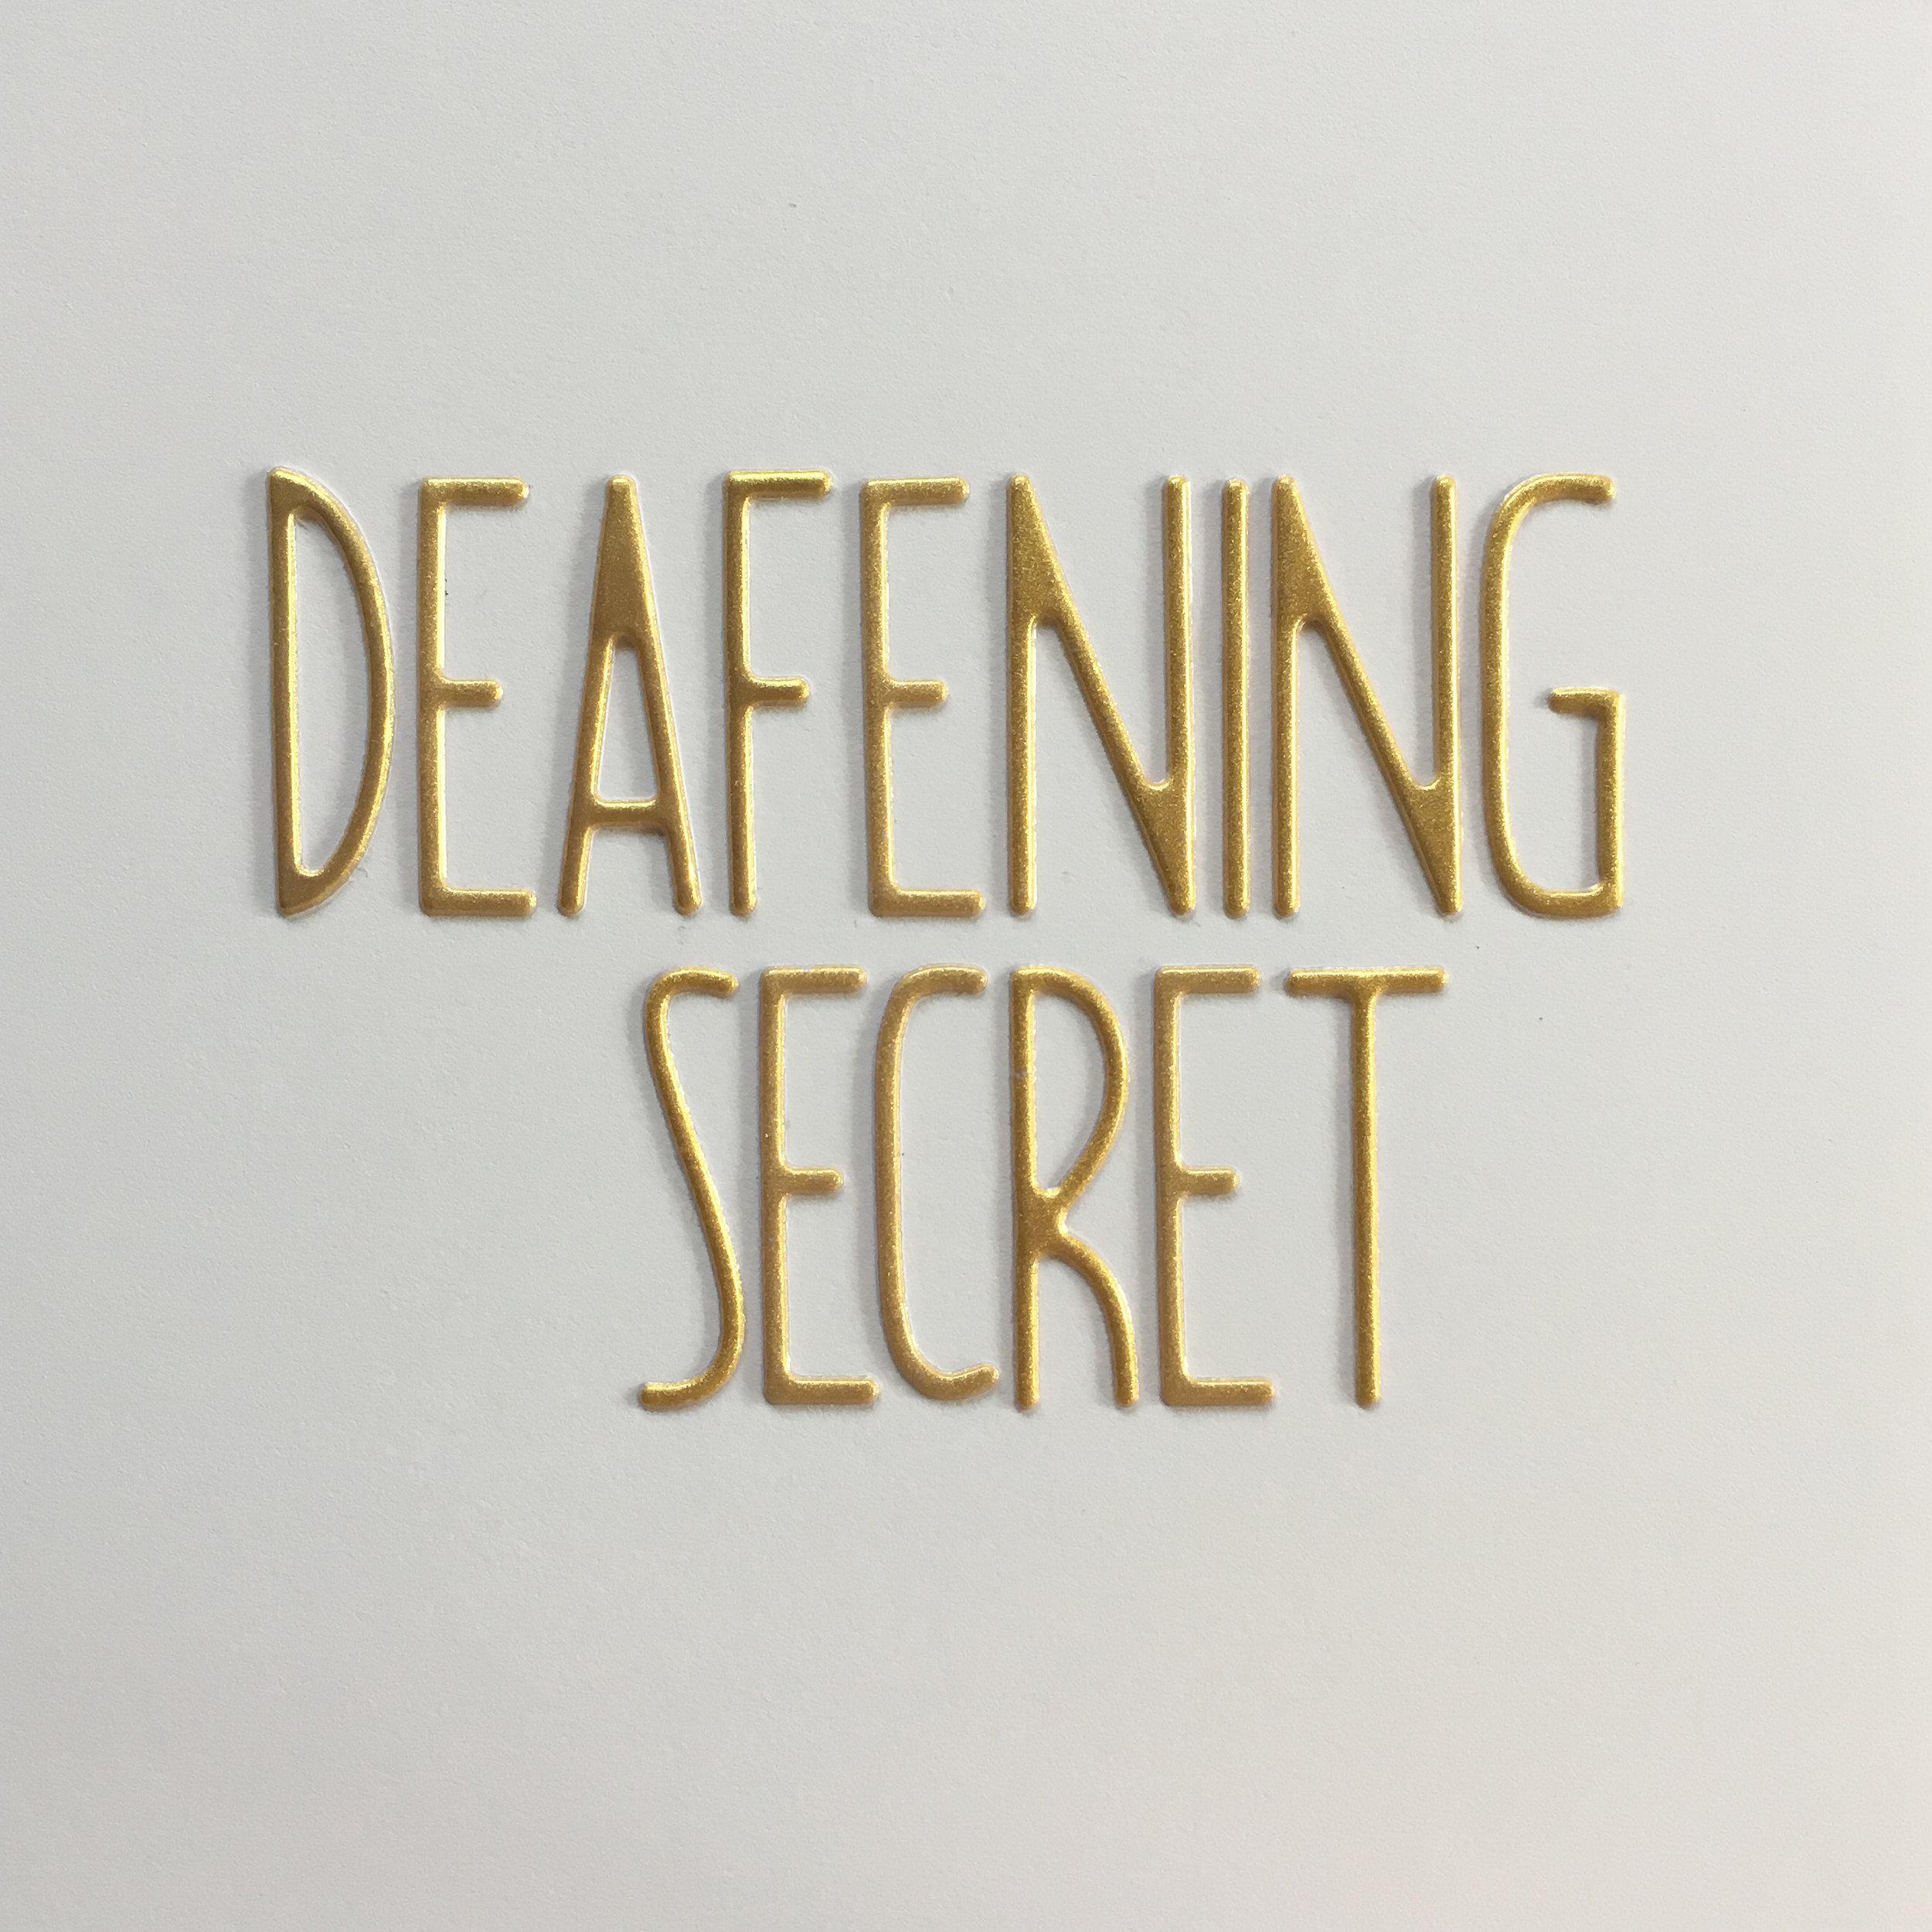 deafening secret.jpg